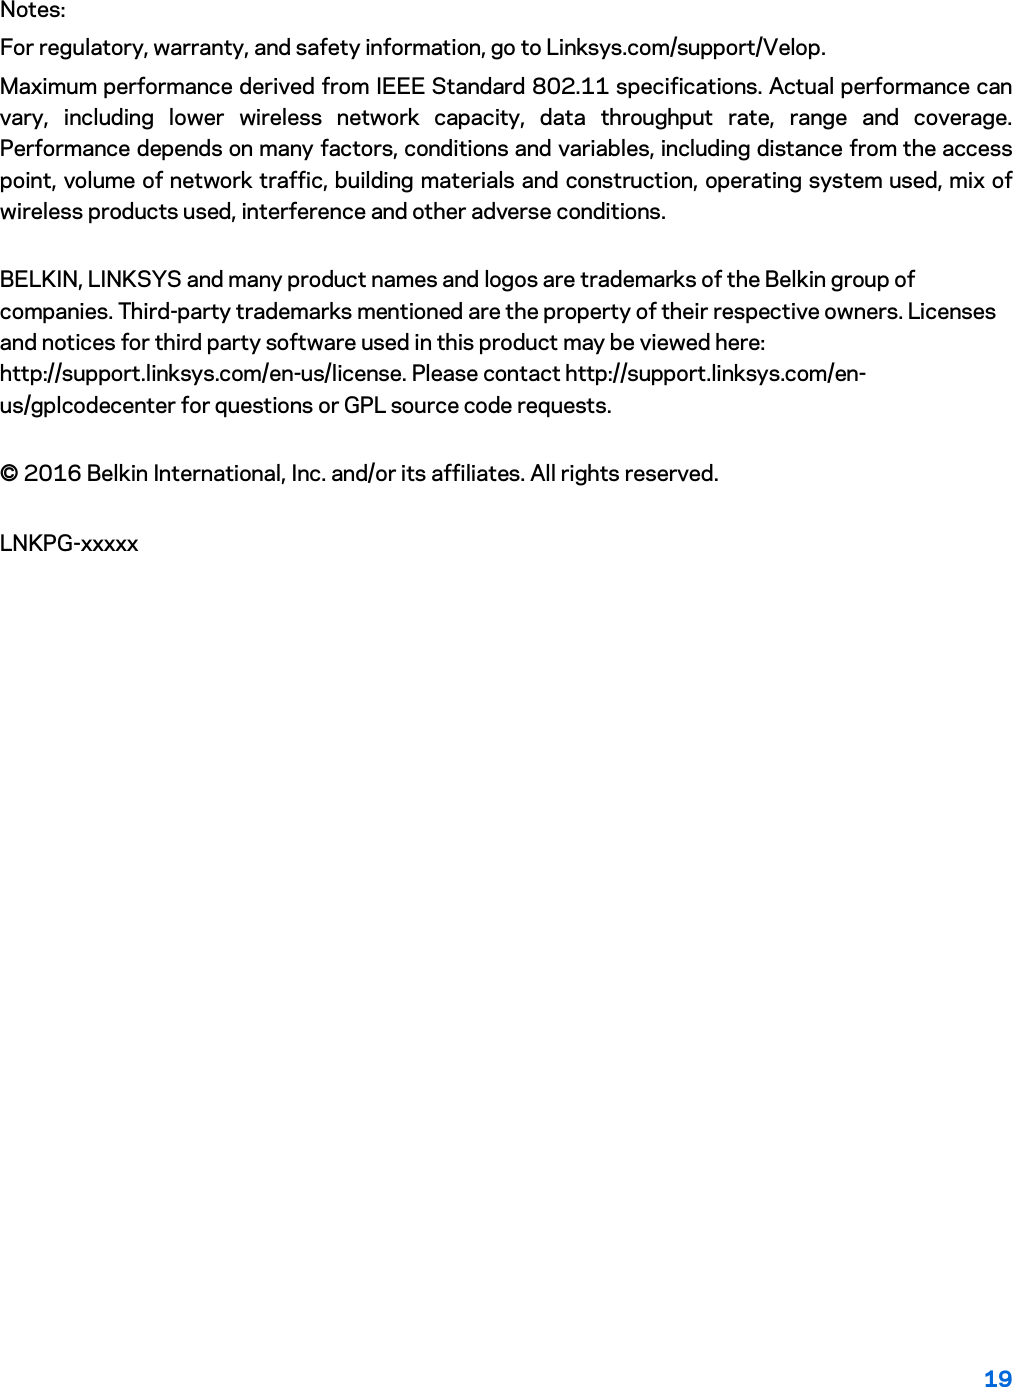 bell 1000 modem manual pdf